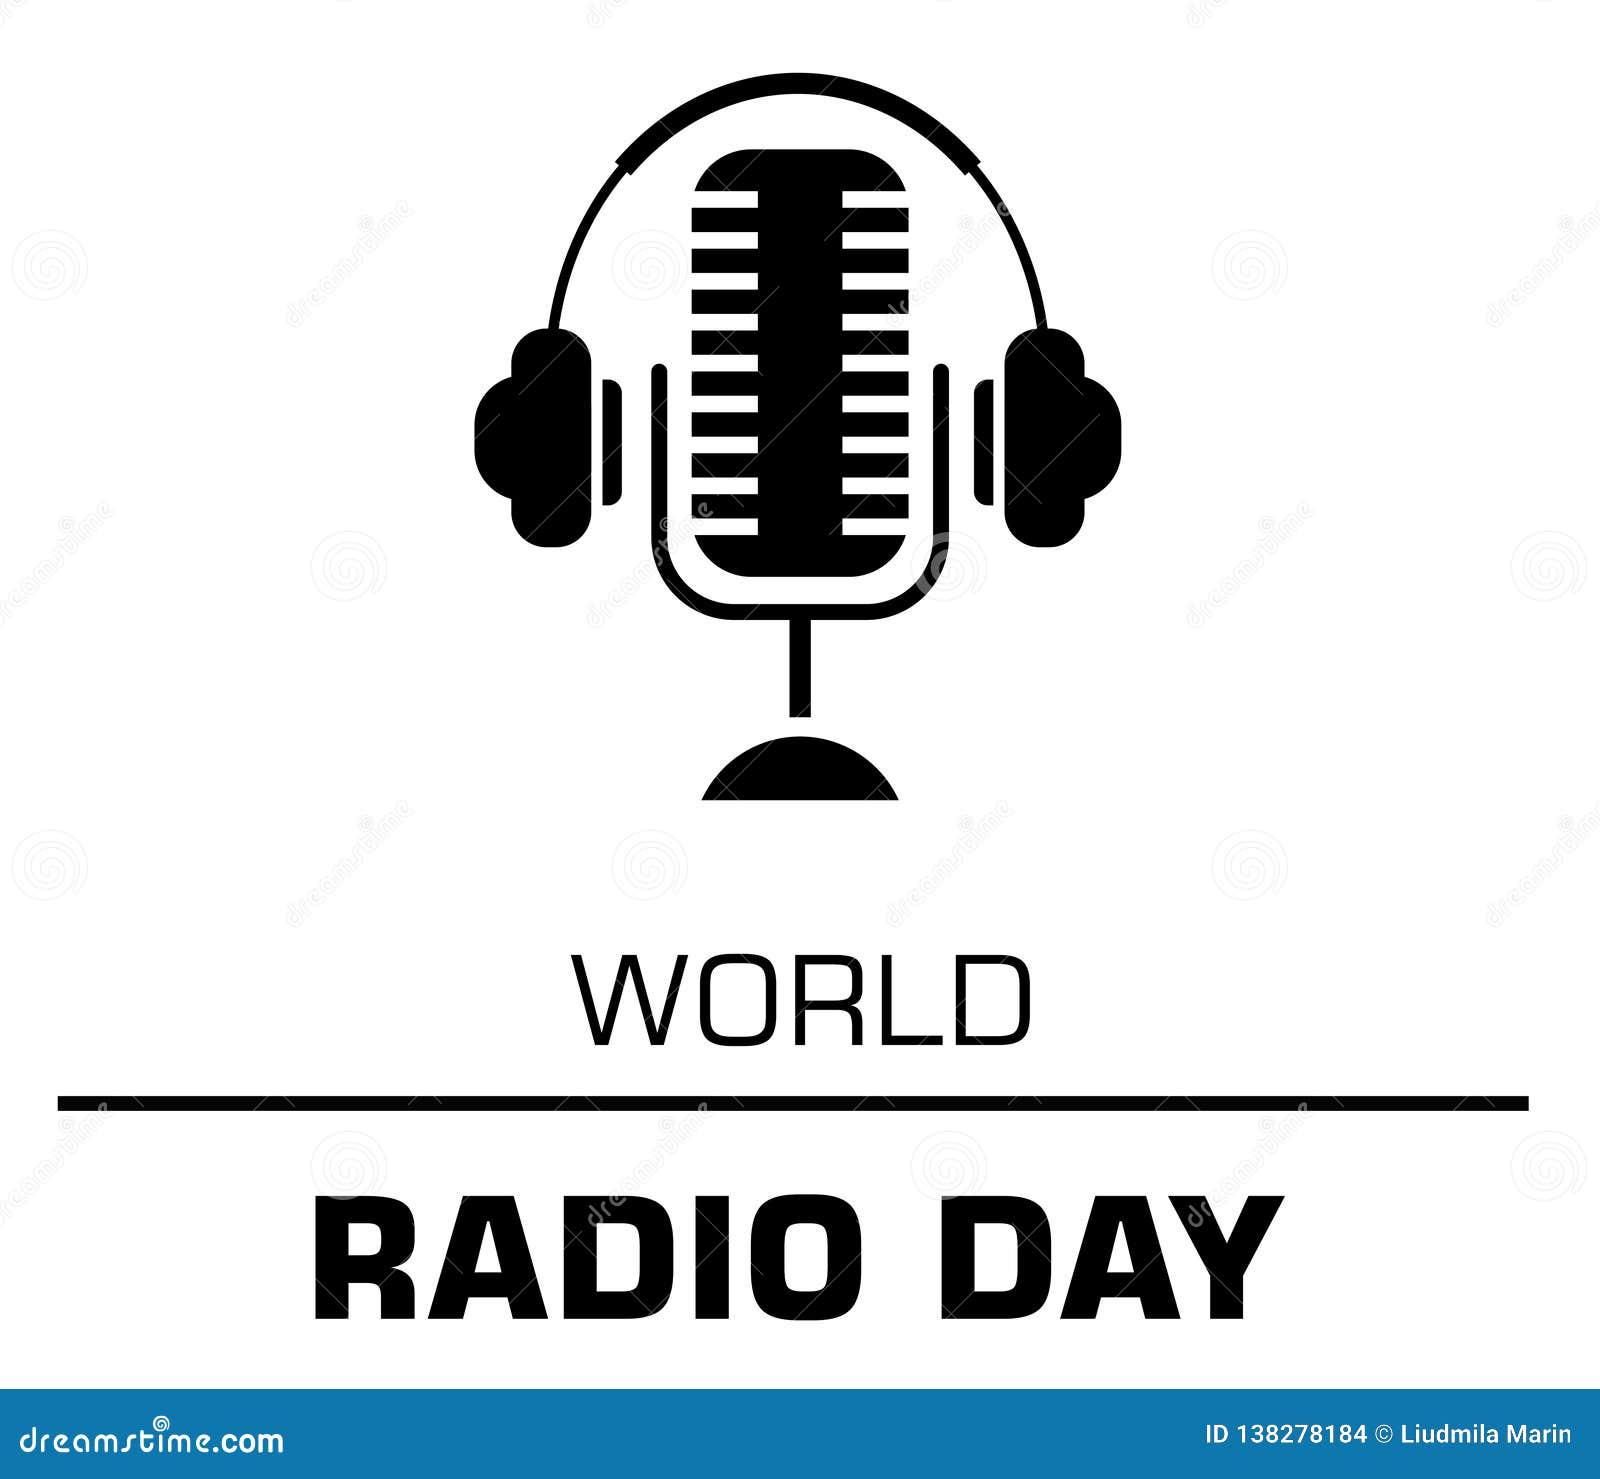 World radio day logo concept on the white background